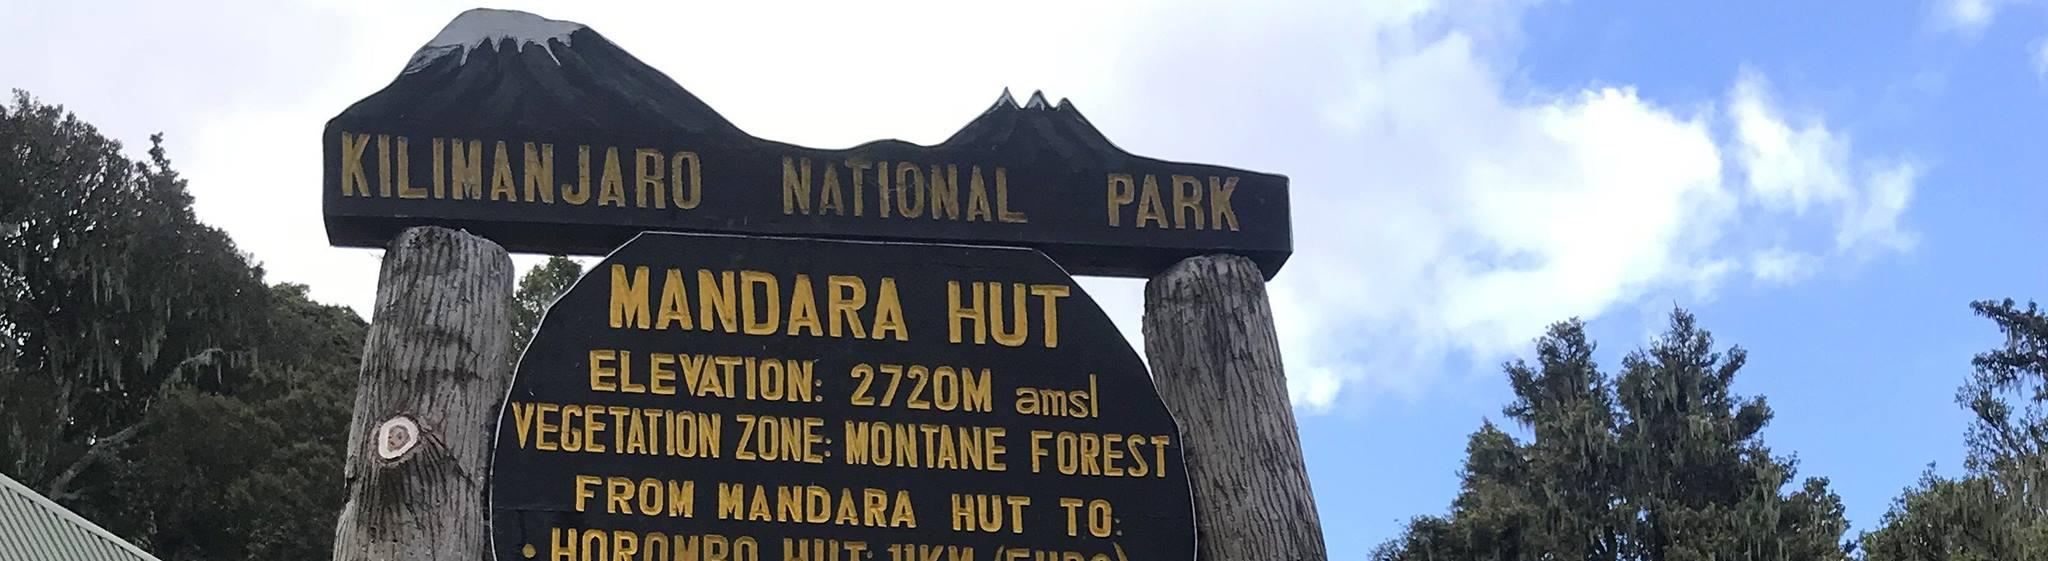 Kilimanjaro day trip climb